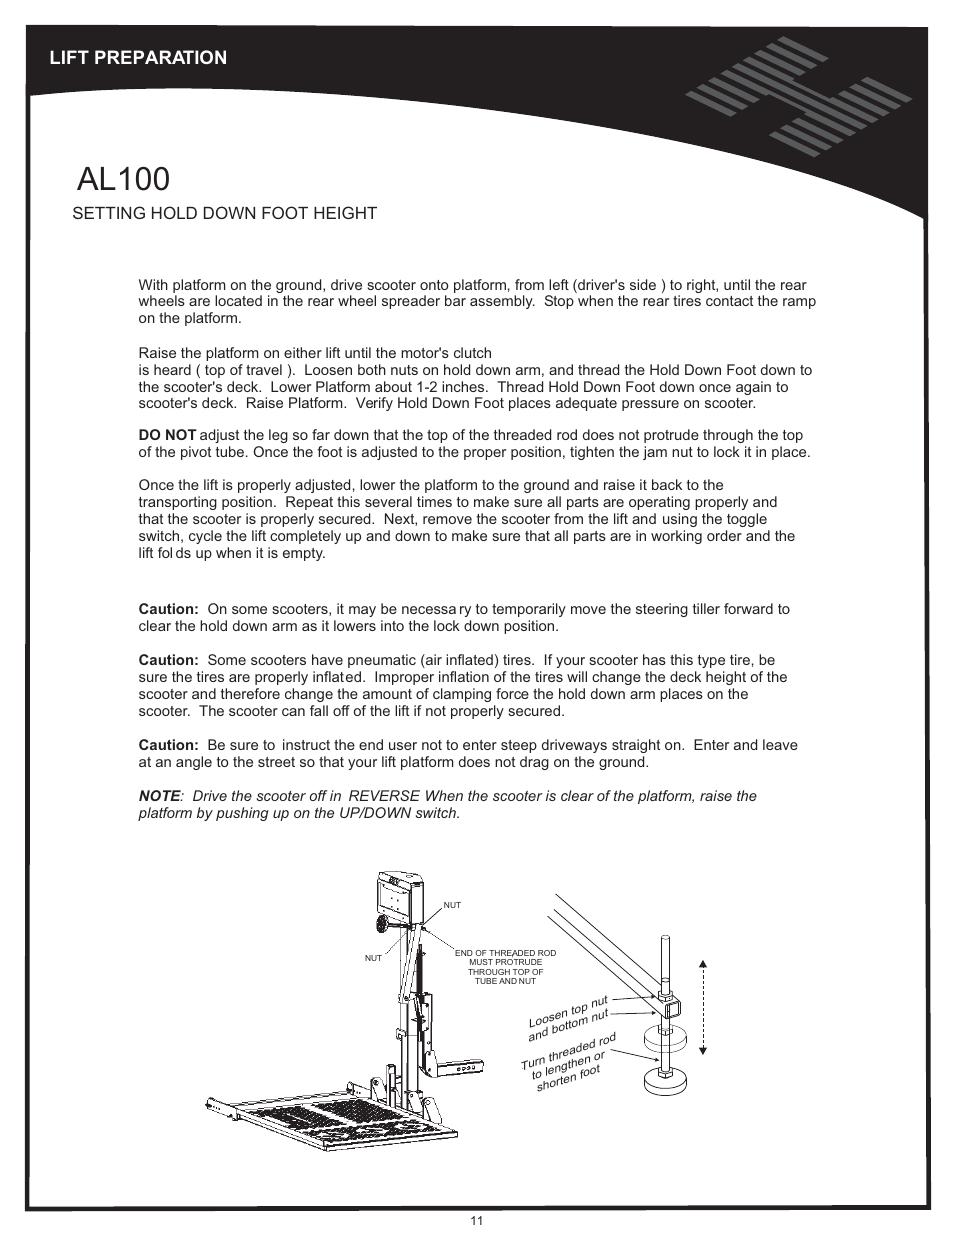 Hold down arm adjustment - al100, Al100, Lift preparation ... Harmar Al Scooter Lift Wiring Diagram on harmar al600 wiring harness, polaris sportsman 500 wiring diagram, harmar dealer locator, harmar al600 manual, harmar mobility dealers, electric bike controller wiring diagram, pride scooter wiring diagram,